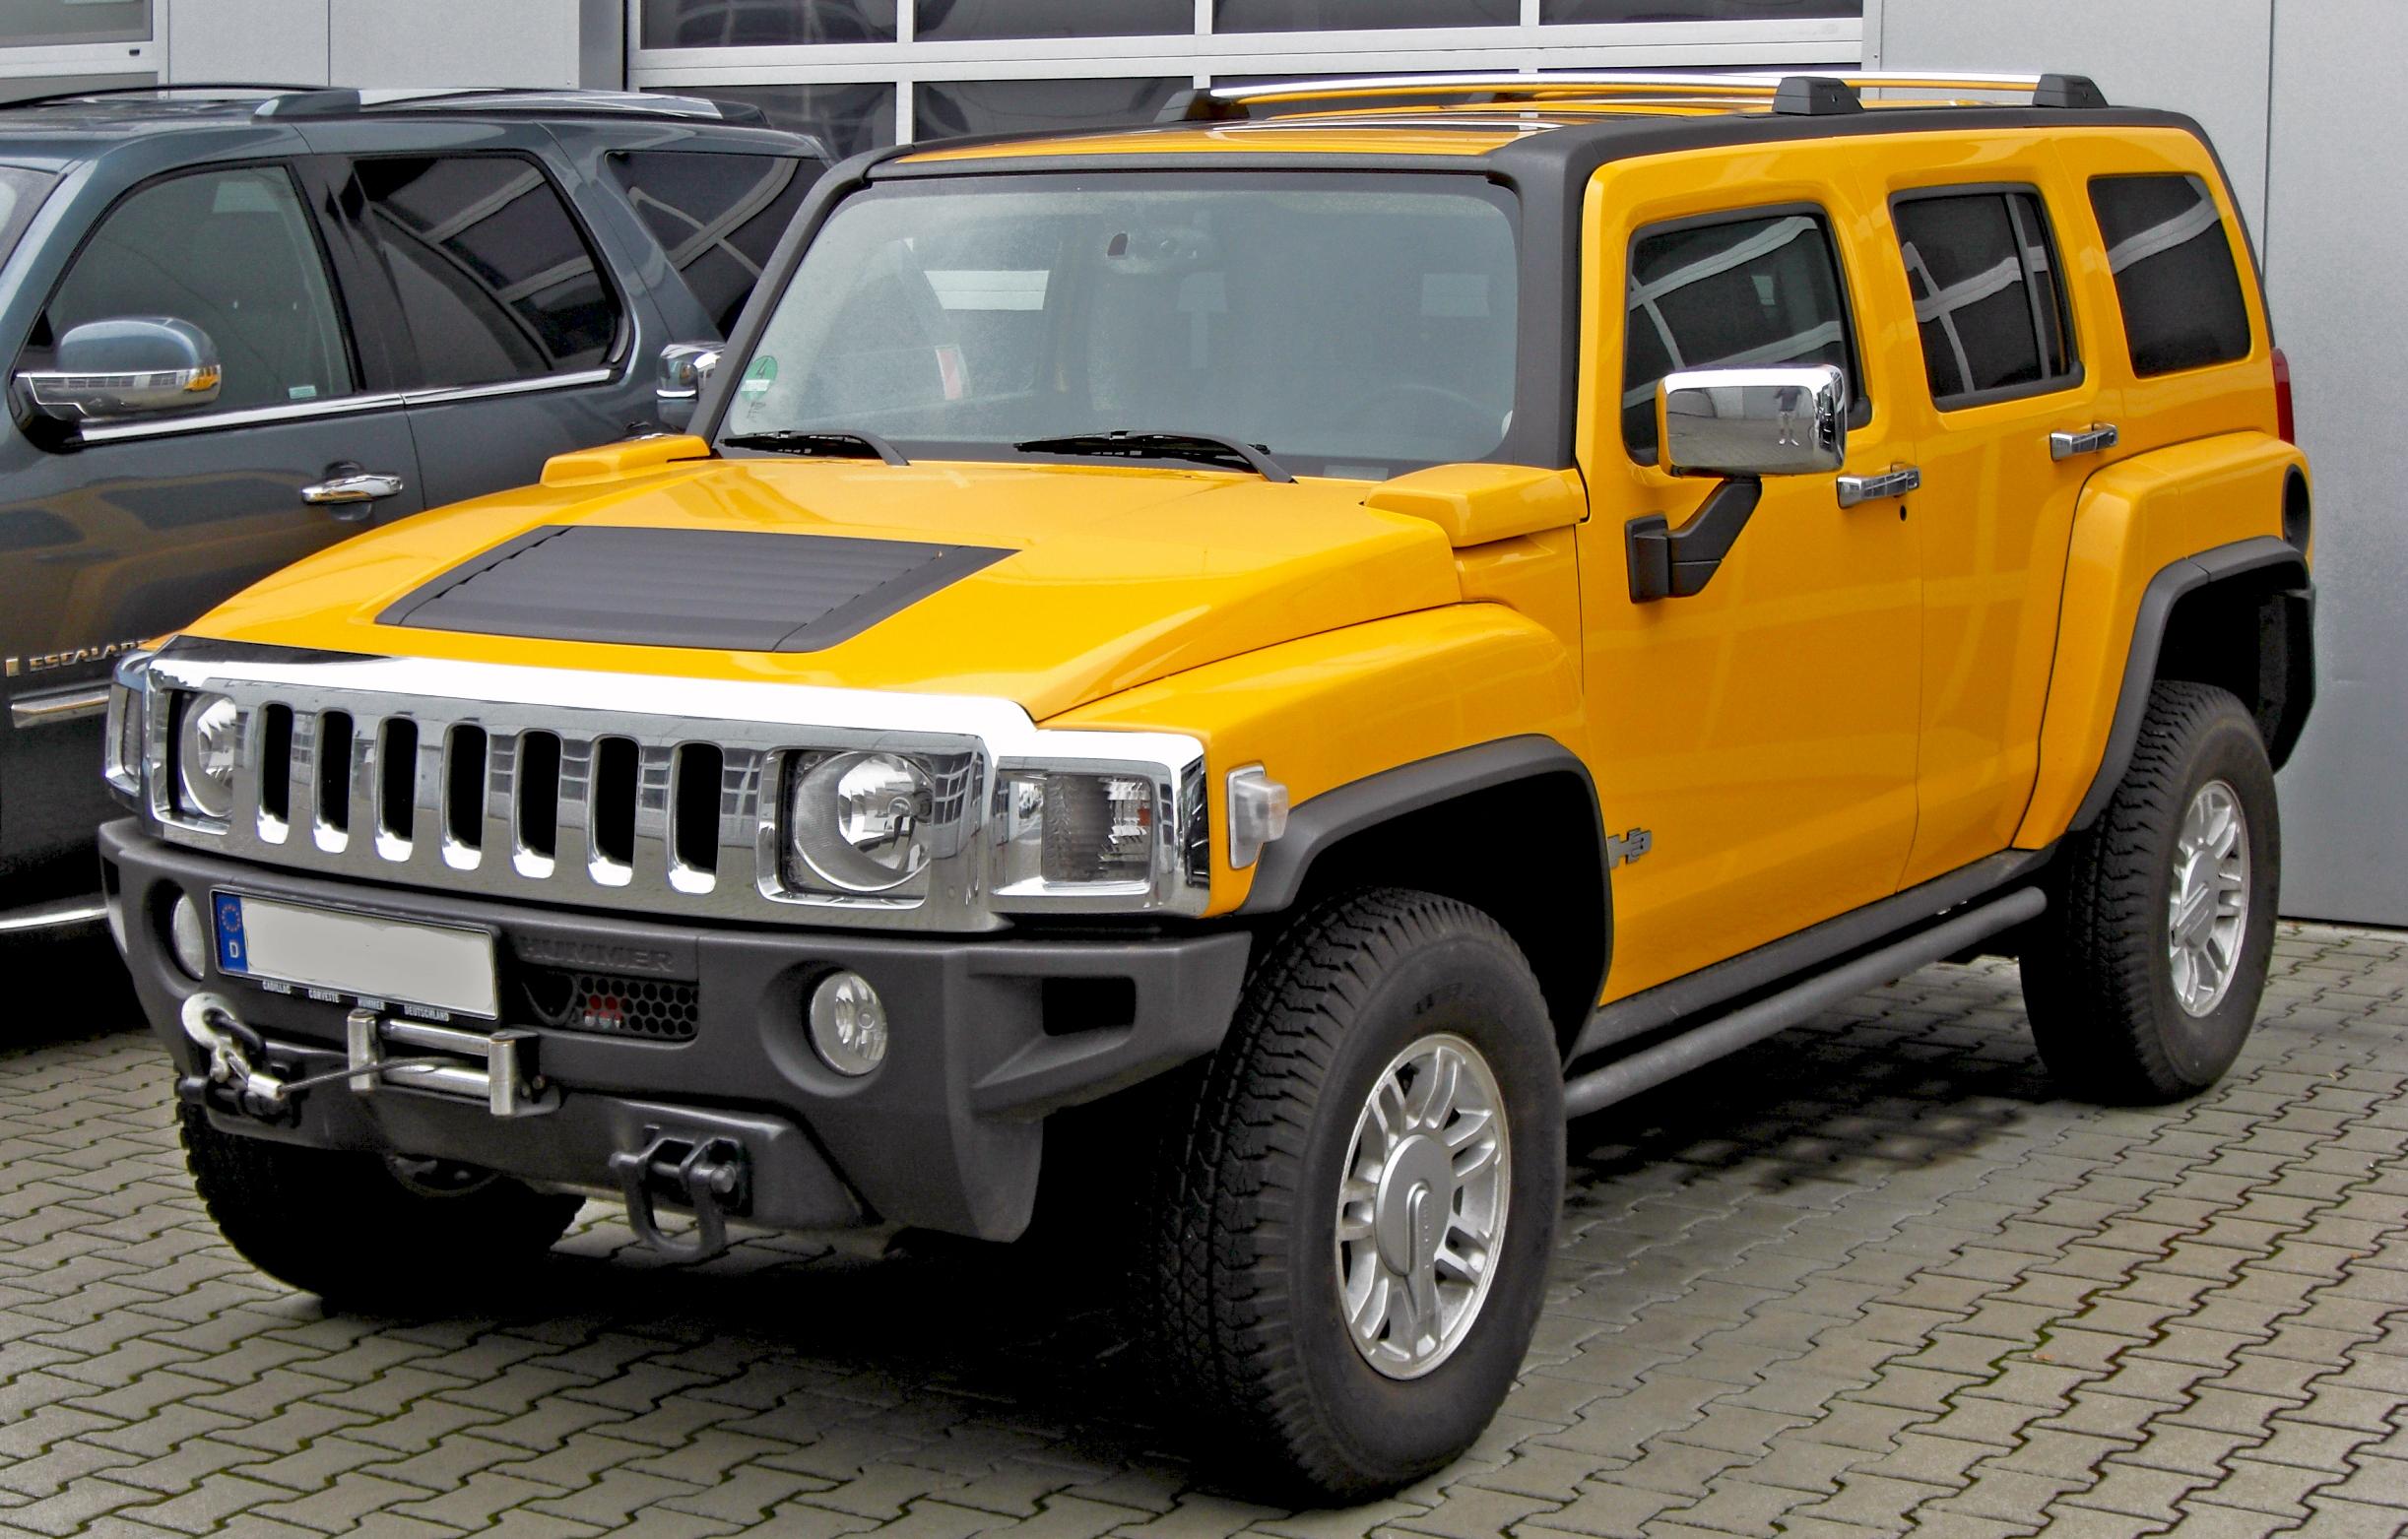 2014 Hummer H3 Yellow